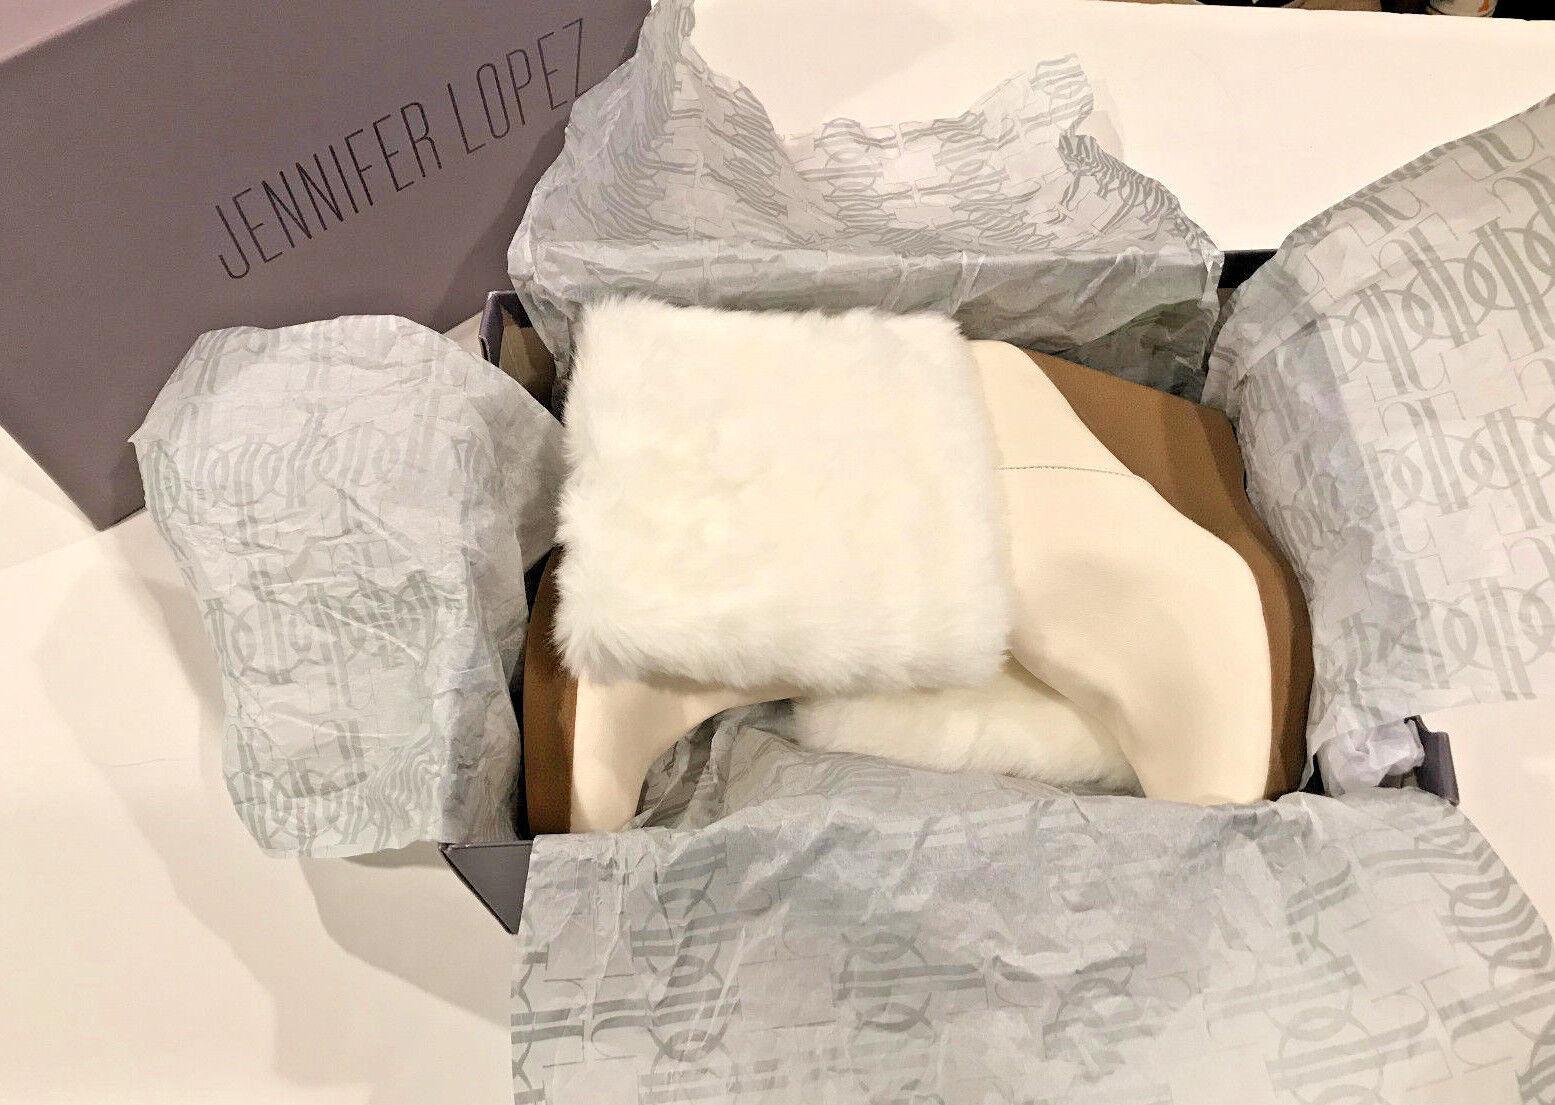 Jennifer lopez womens wedge boots size 8 alpina cream euc